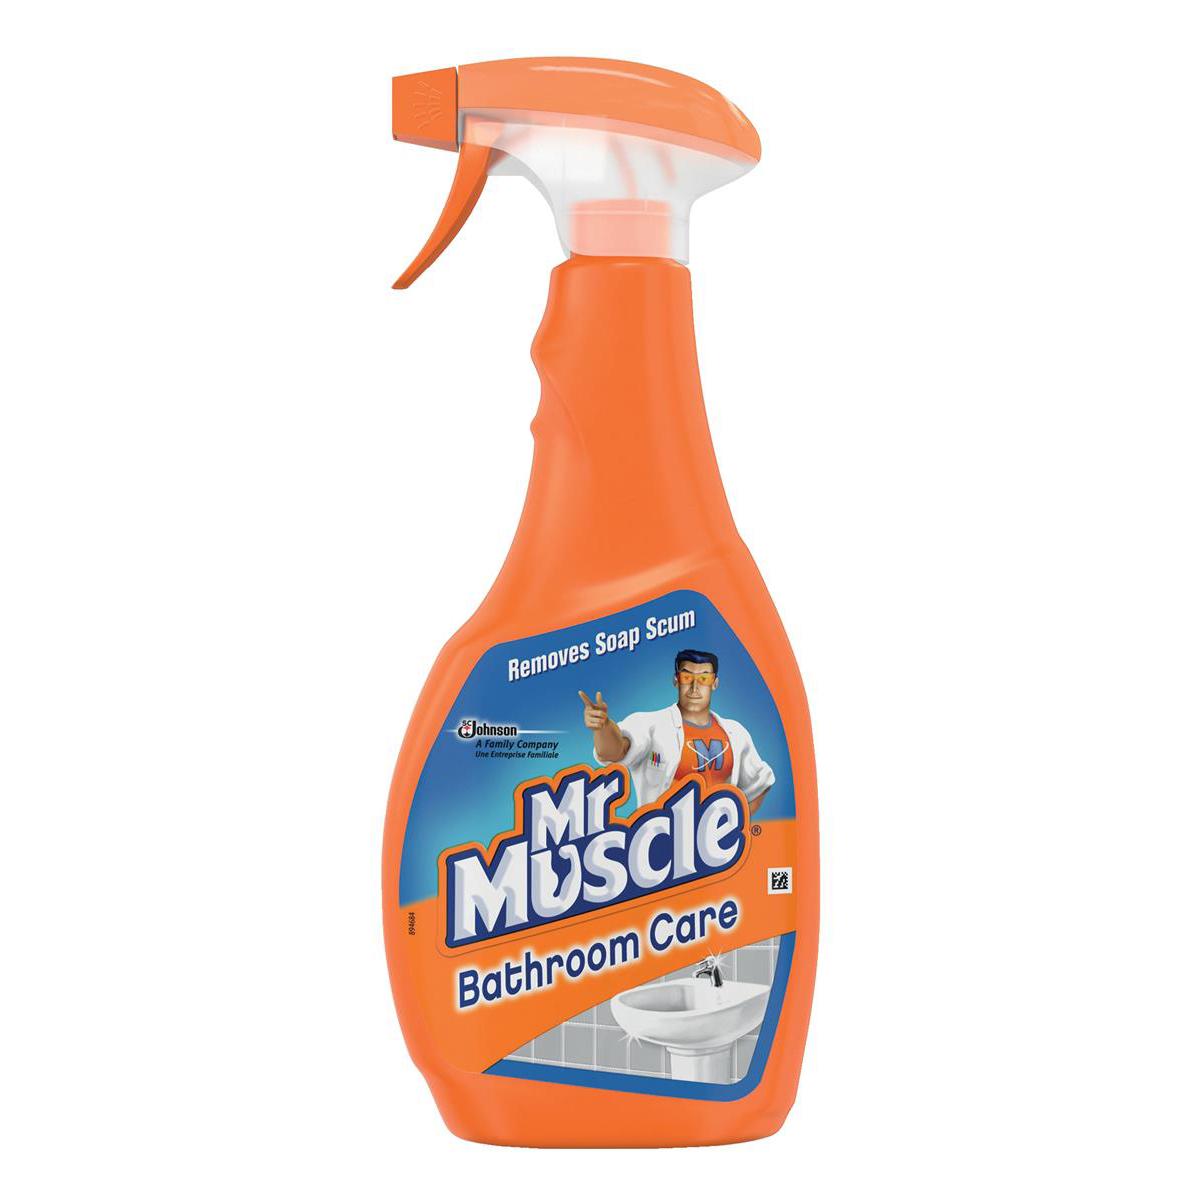 Mr Muscle Bathroom Cleaner Spray Bottle 5 in 1 500ml Ref 1005055